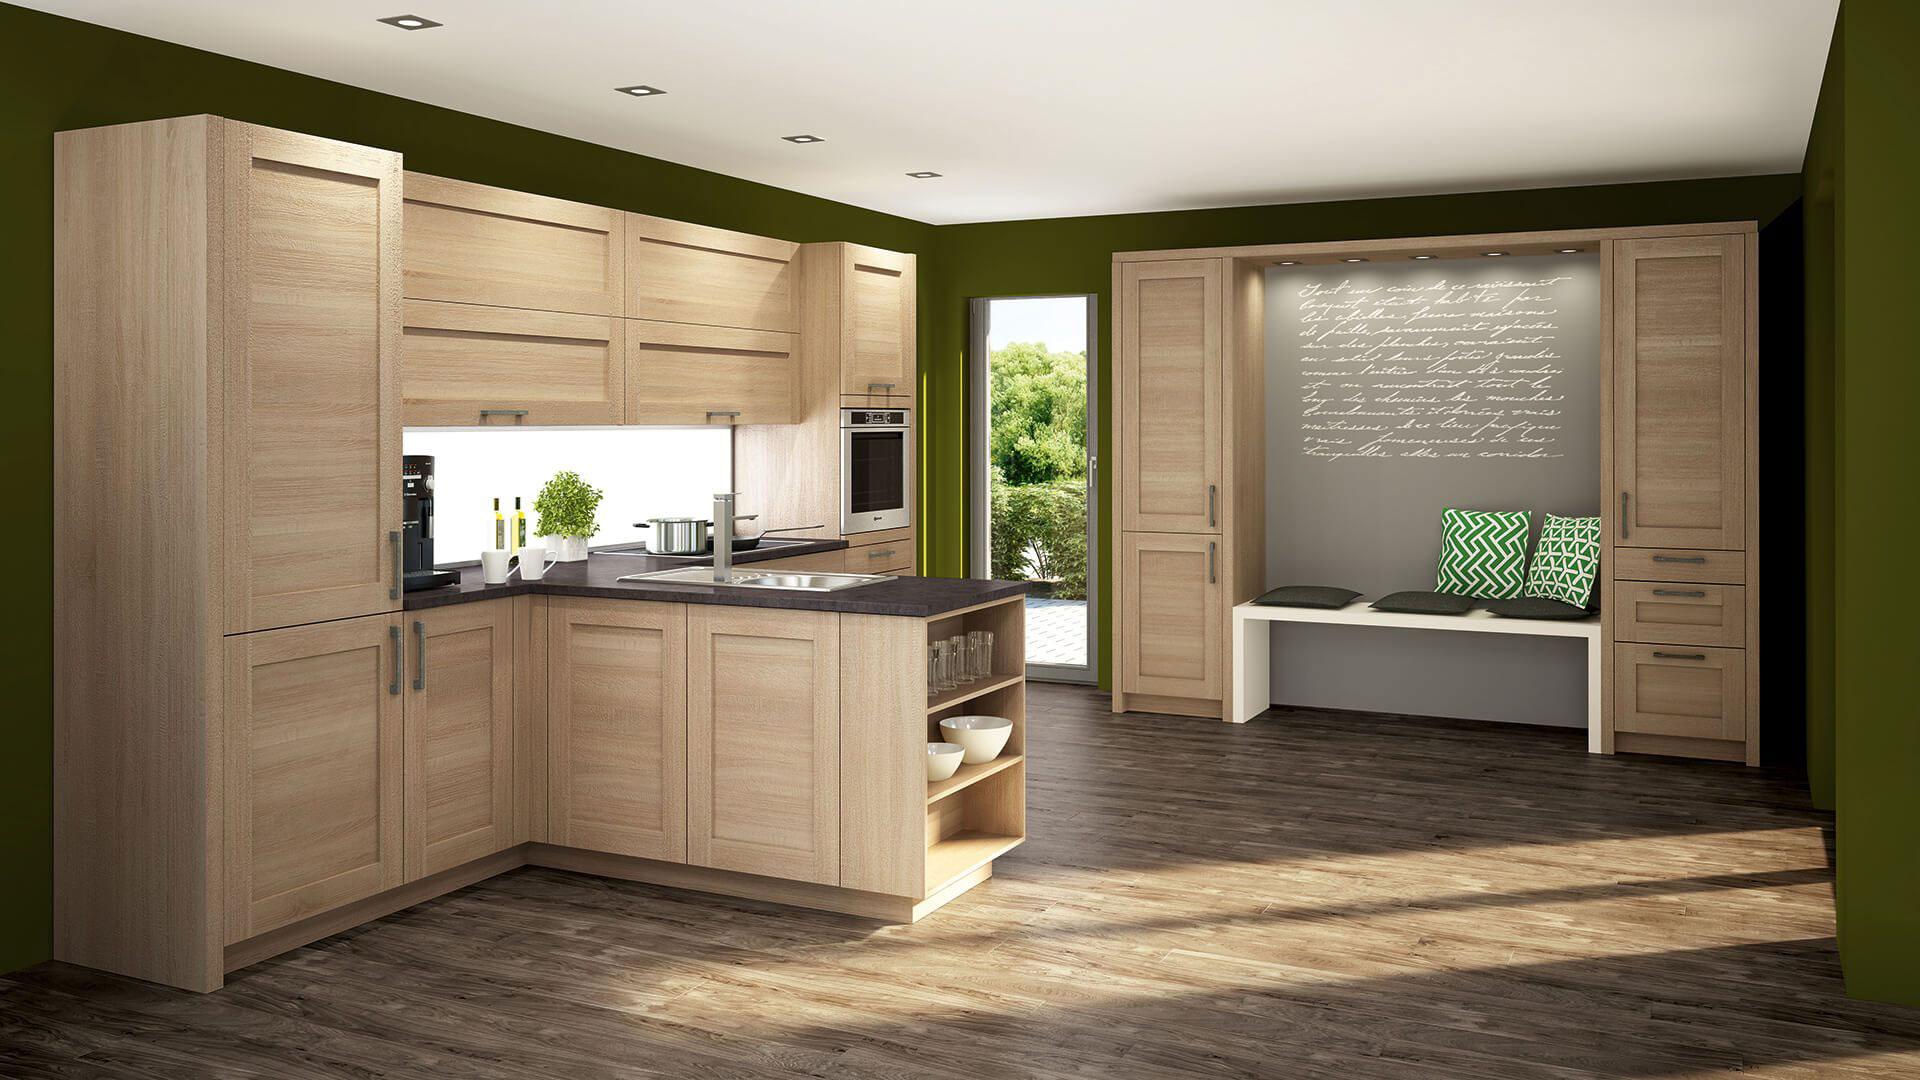 Küchenfußboden aus PVC in Holzoptik